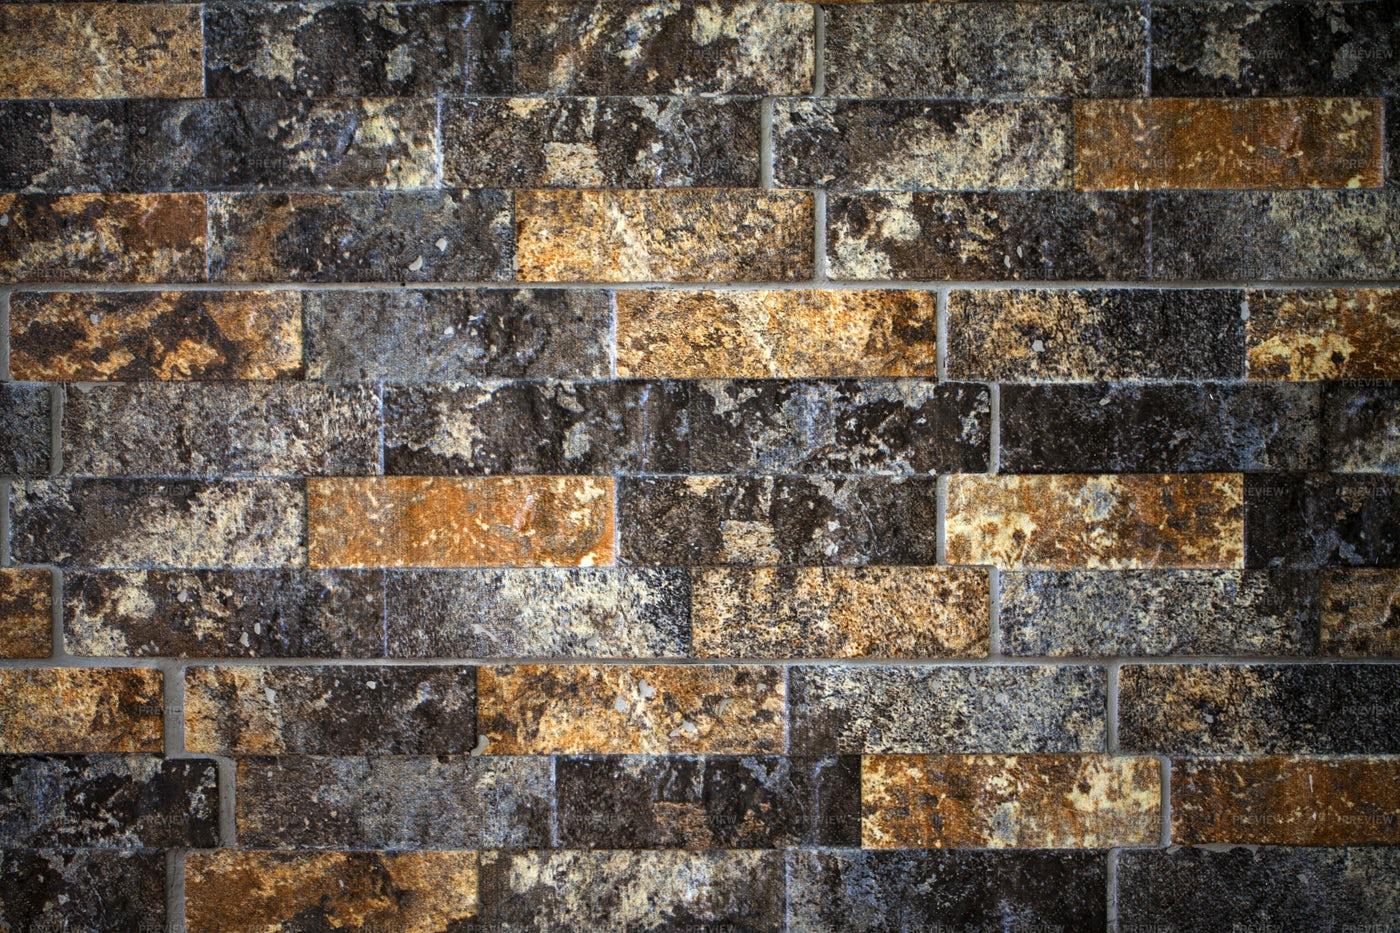 Grunge Stone Brick Wall Background: Stock Photos